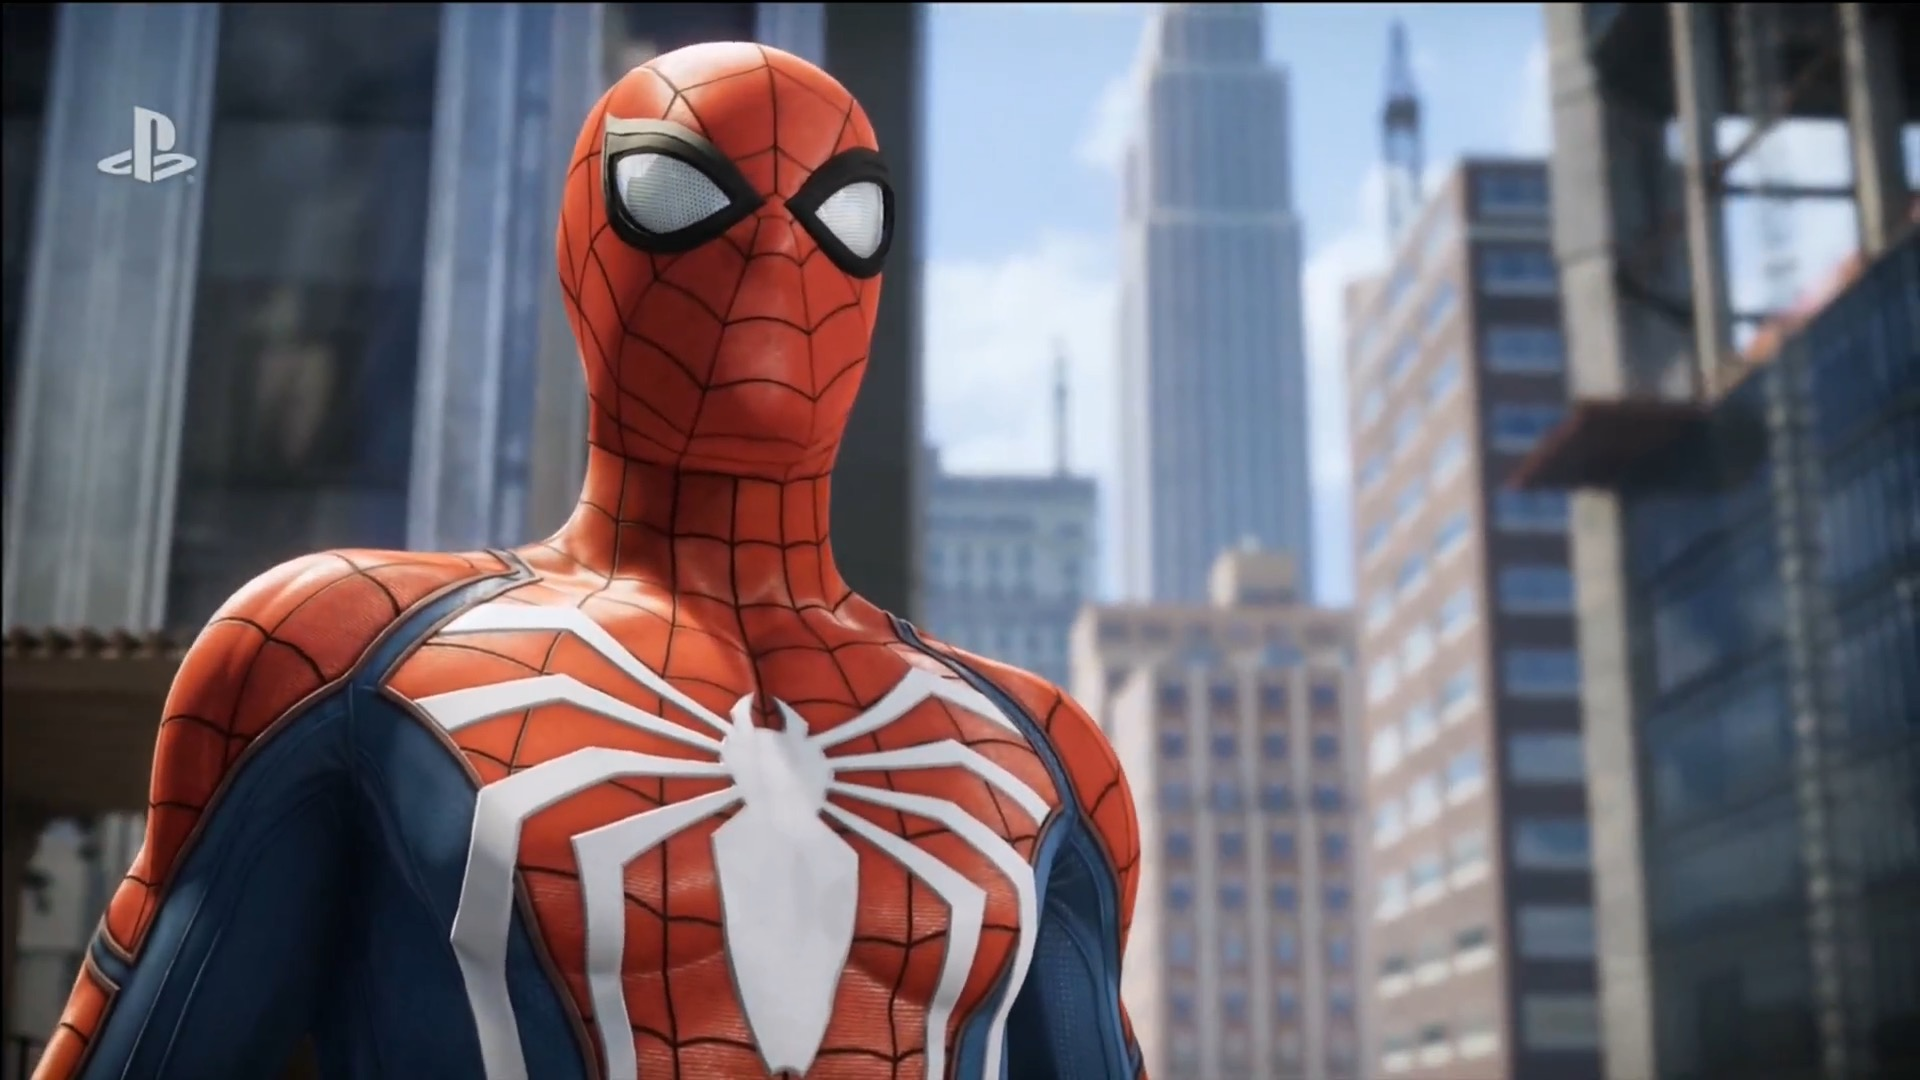 Spider-Man recenzija – Mali veliki pauk